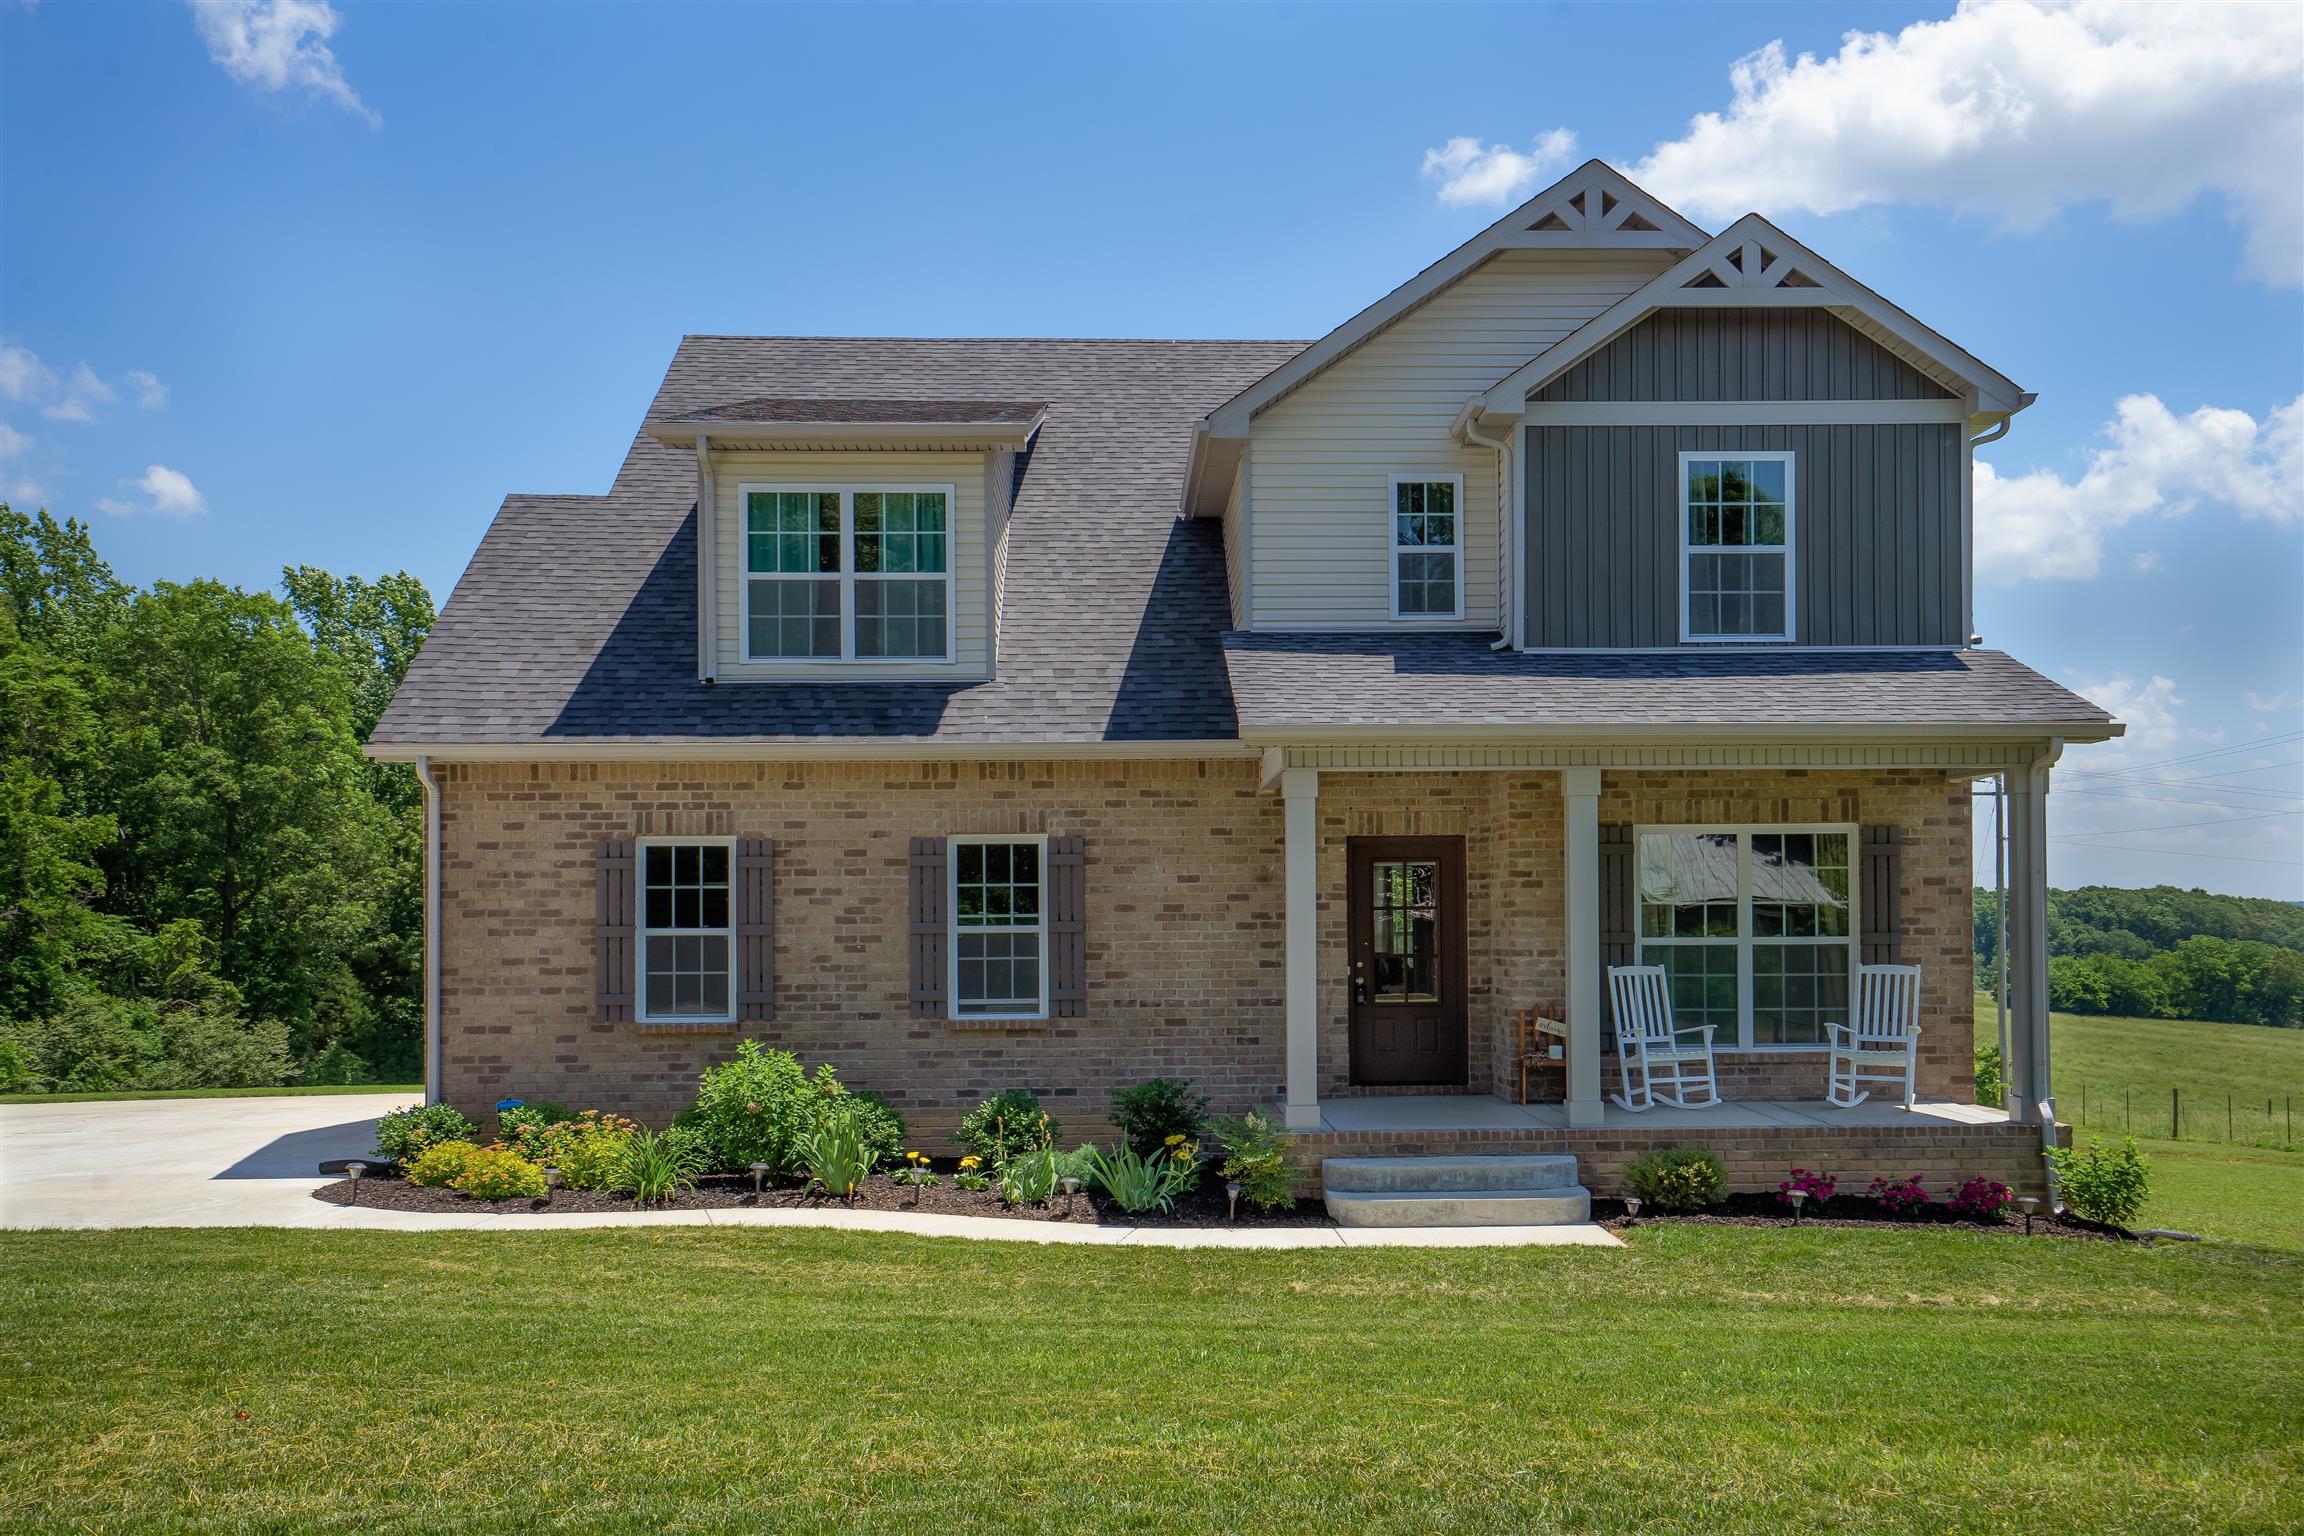 5361 Old Highway 48, Southside, TN 37171 - Southside, TN real estate listing